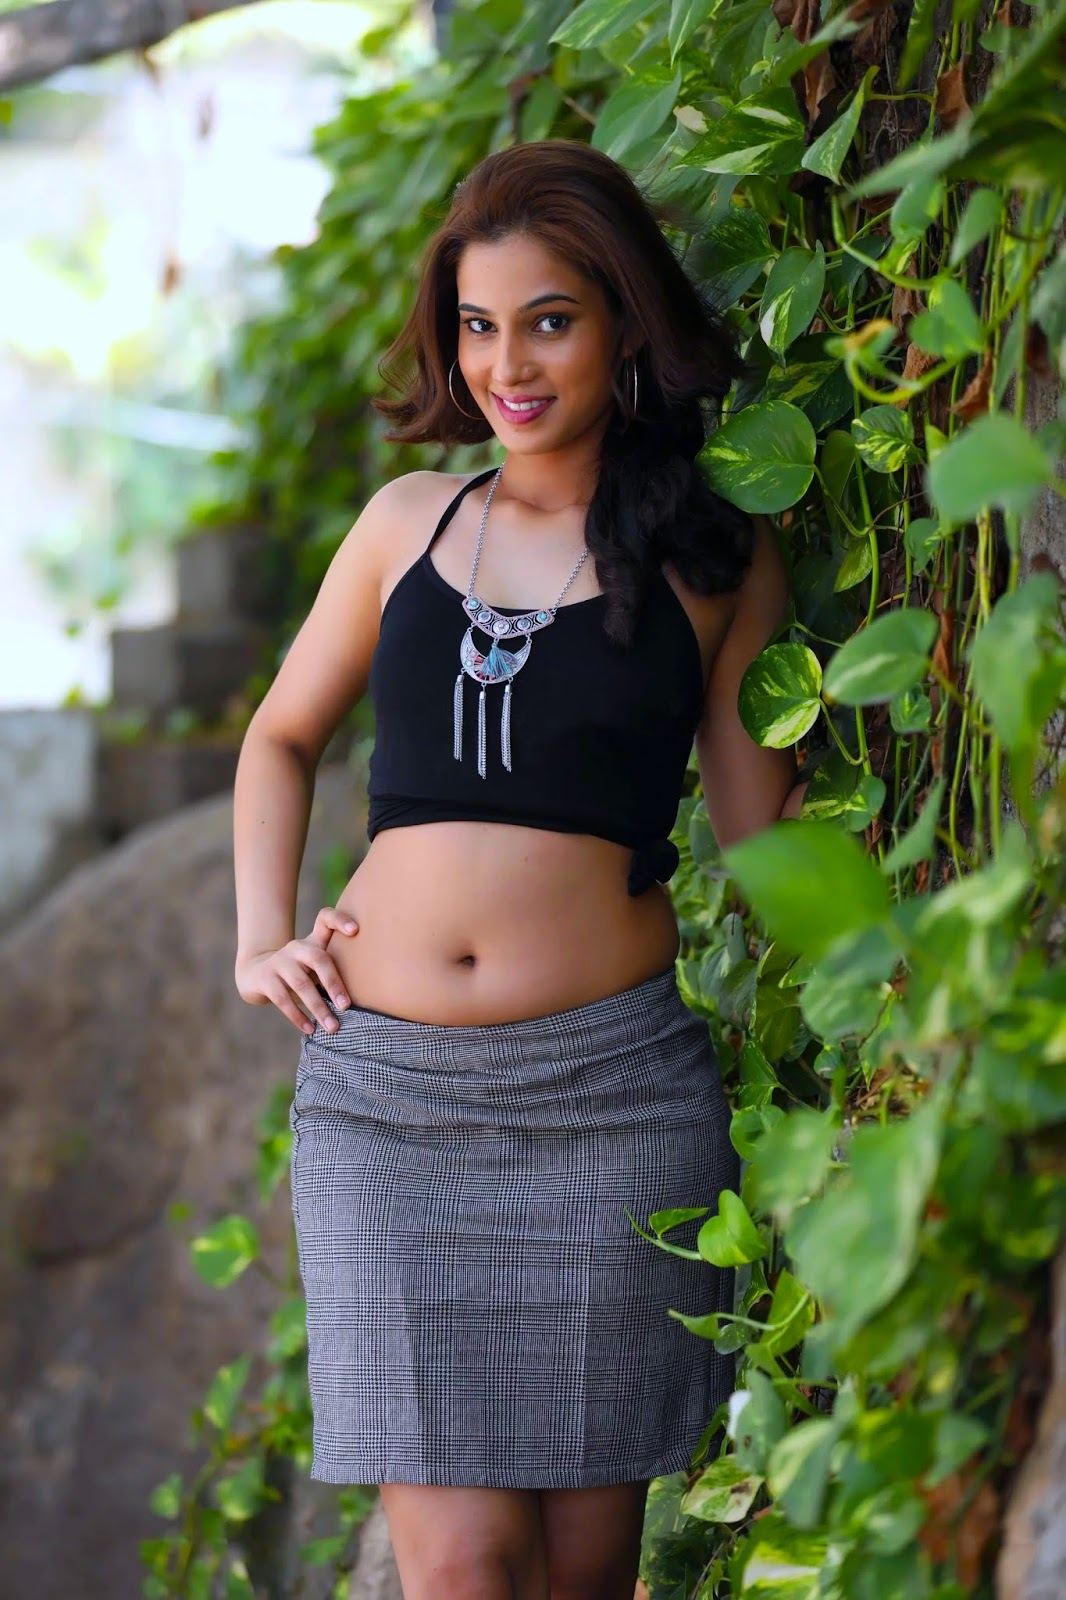 Top sweet faces: Pooja Desai Captivating Beauty Hot Navel